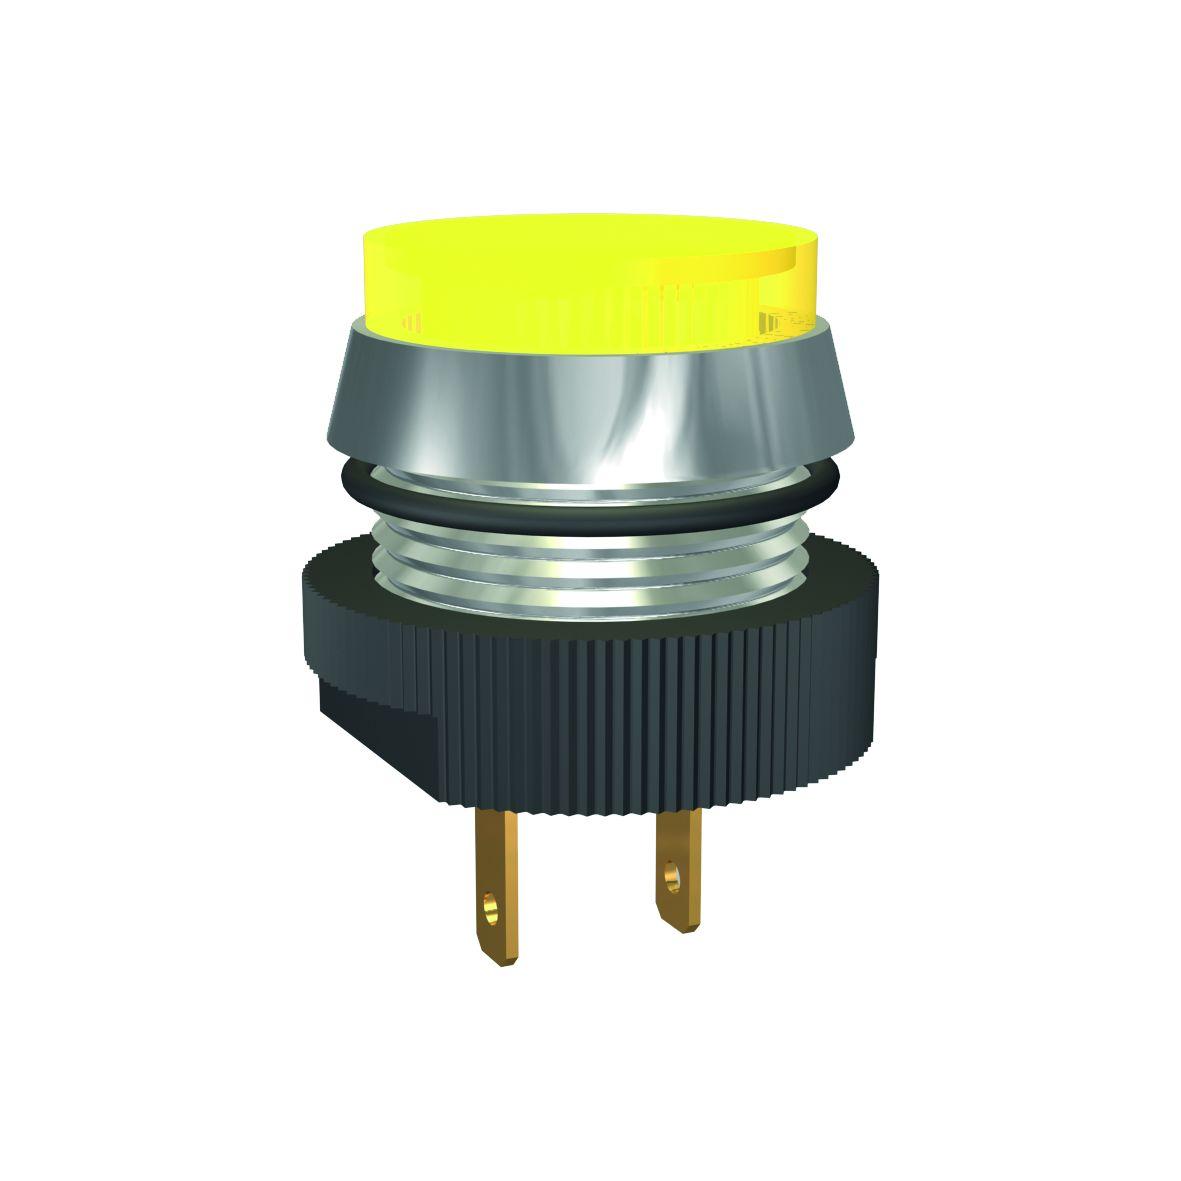 LED-Signalleuchte Ø16mm